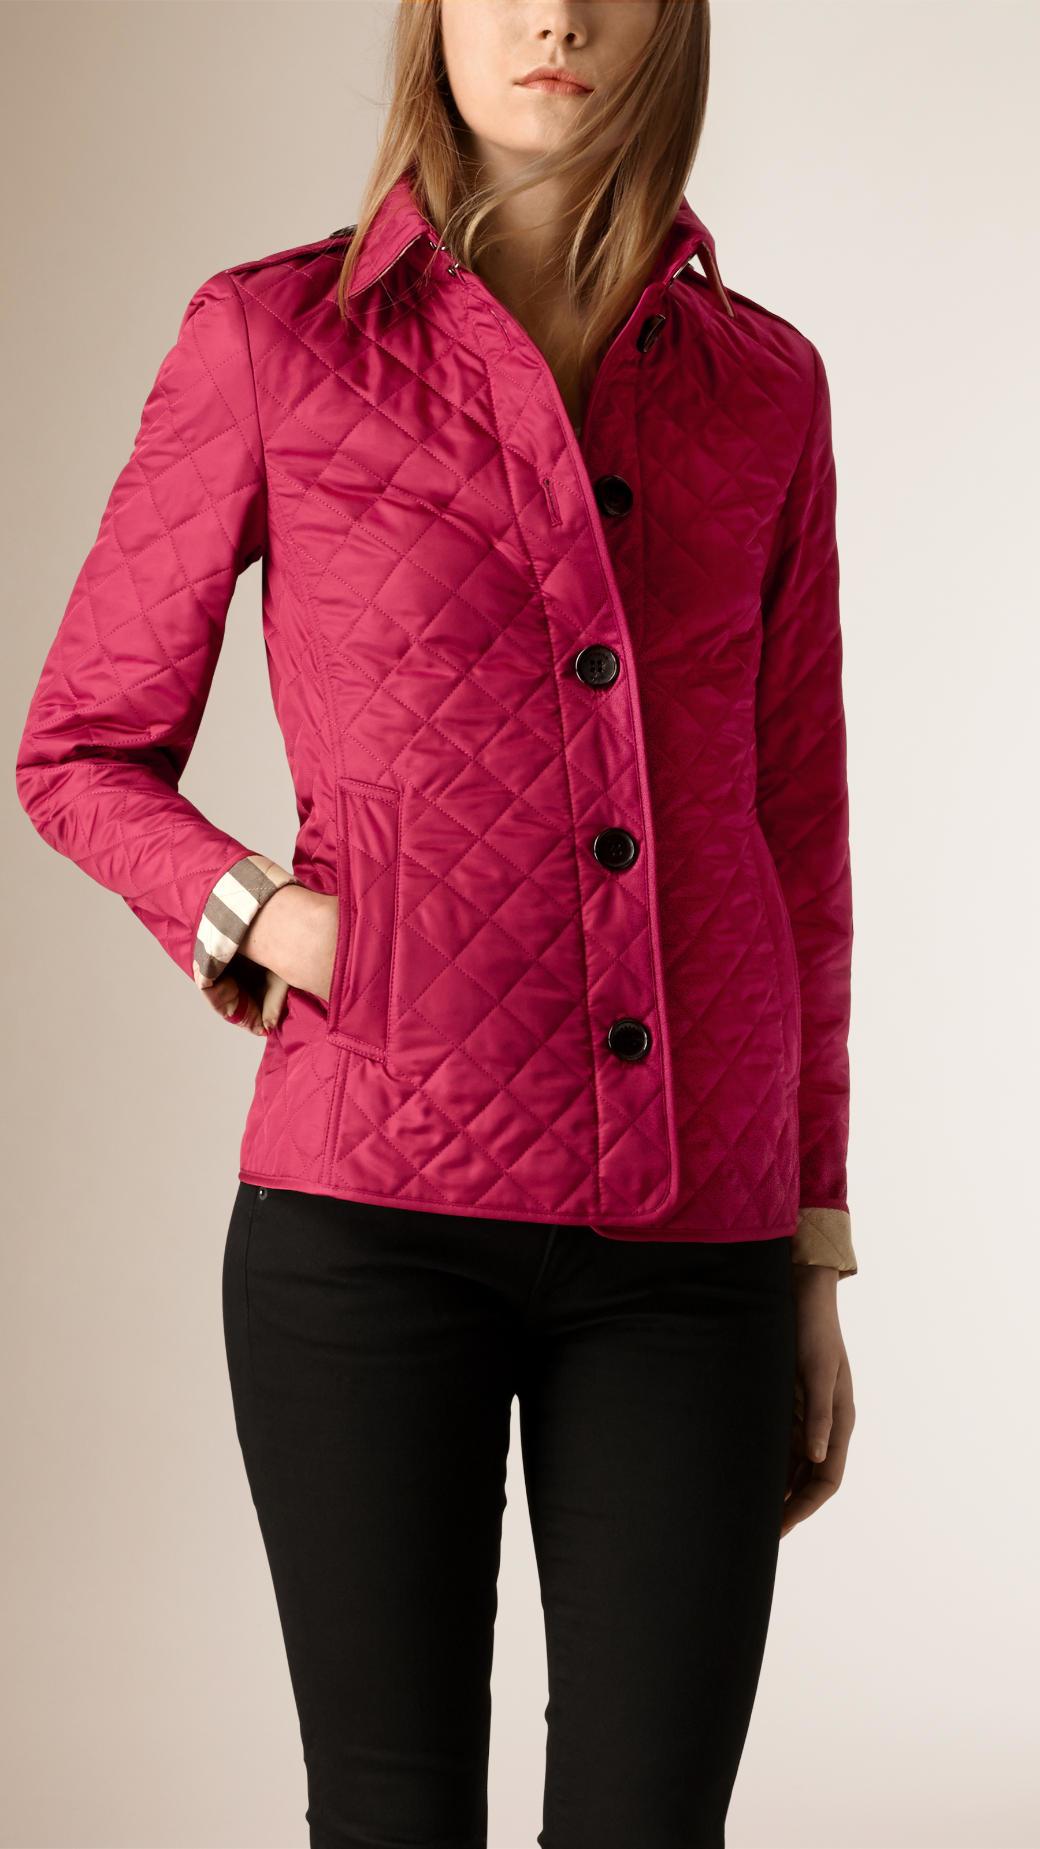 Burberry Showerproof Taffeta Trench Jacket With Detachable